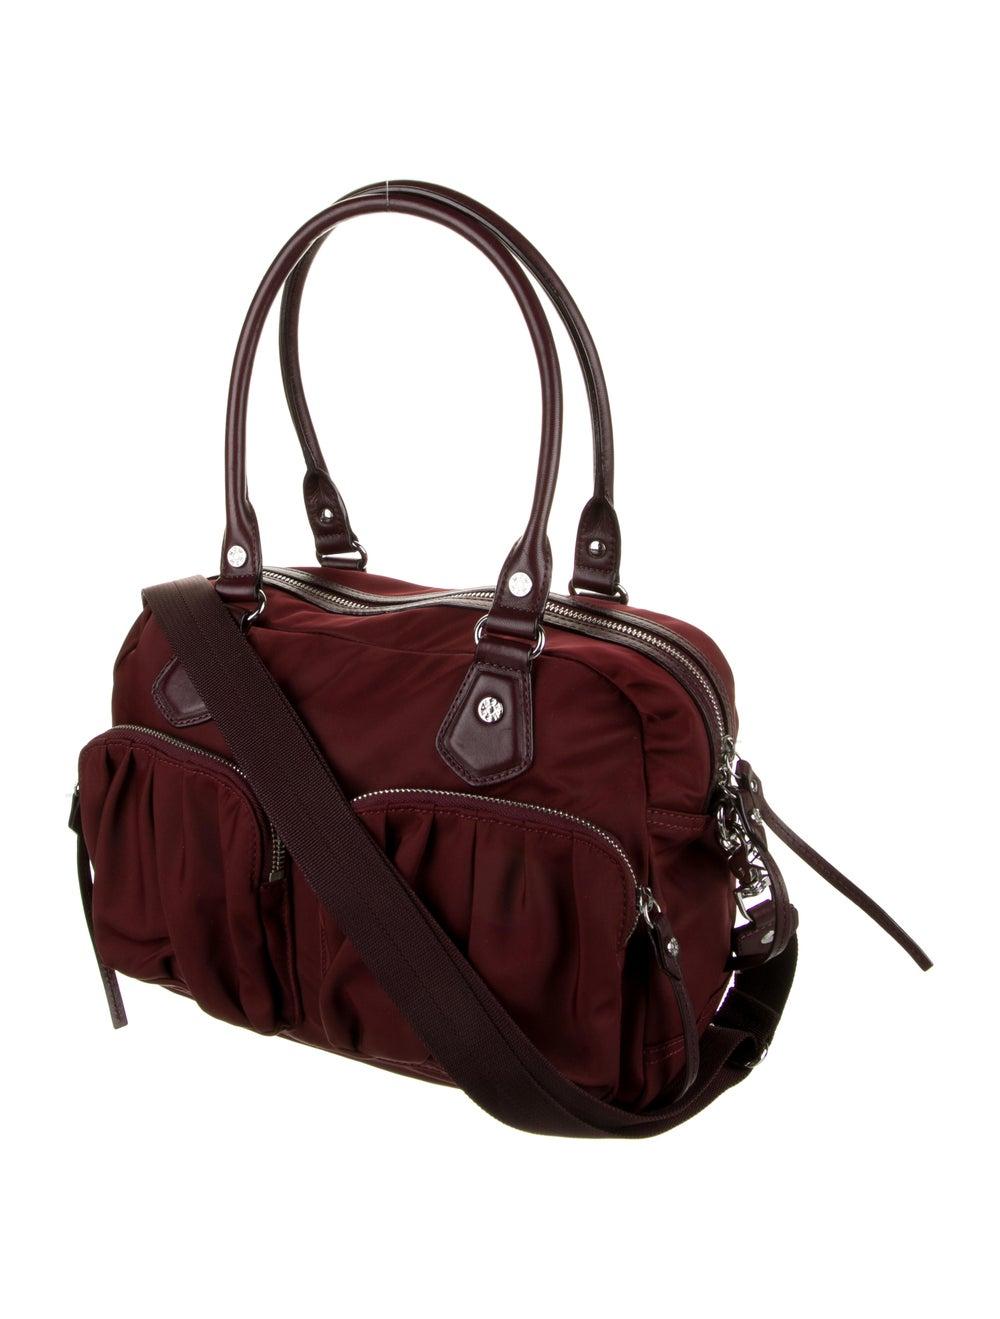 MZ Wallace Nylon Shoulder Bag Red - image 3